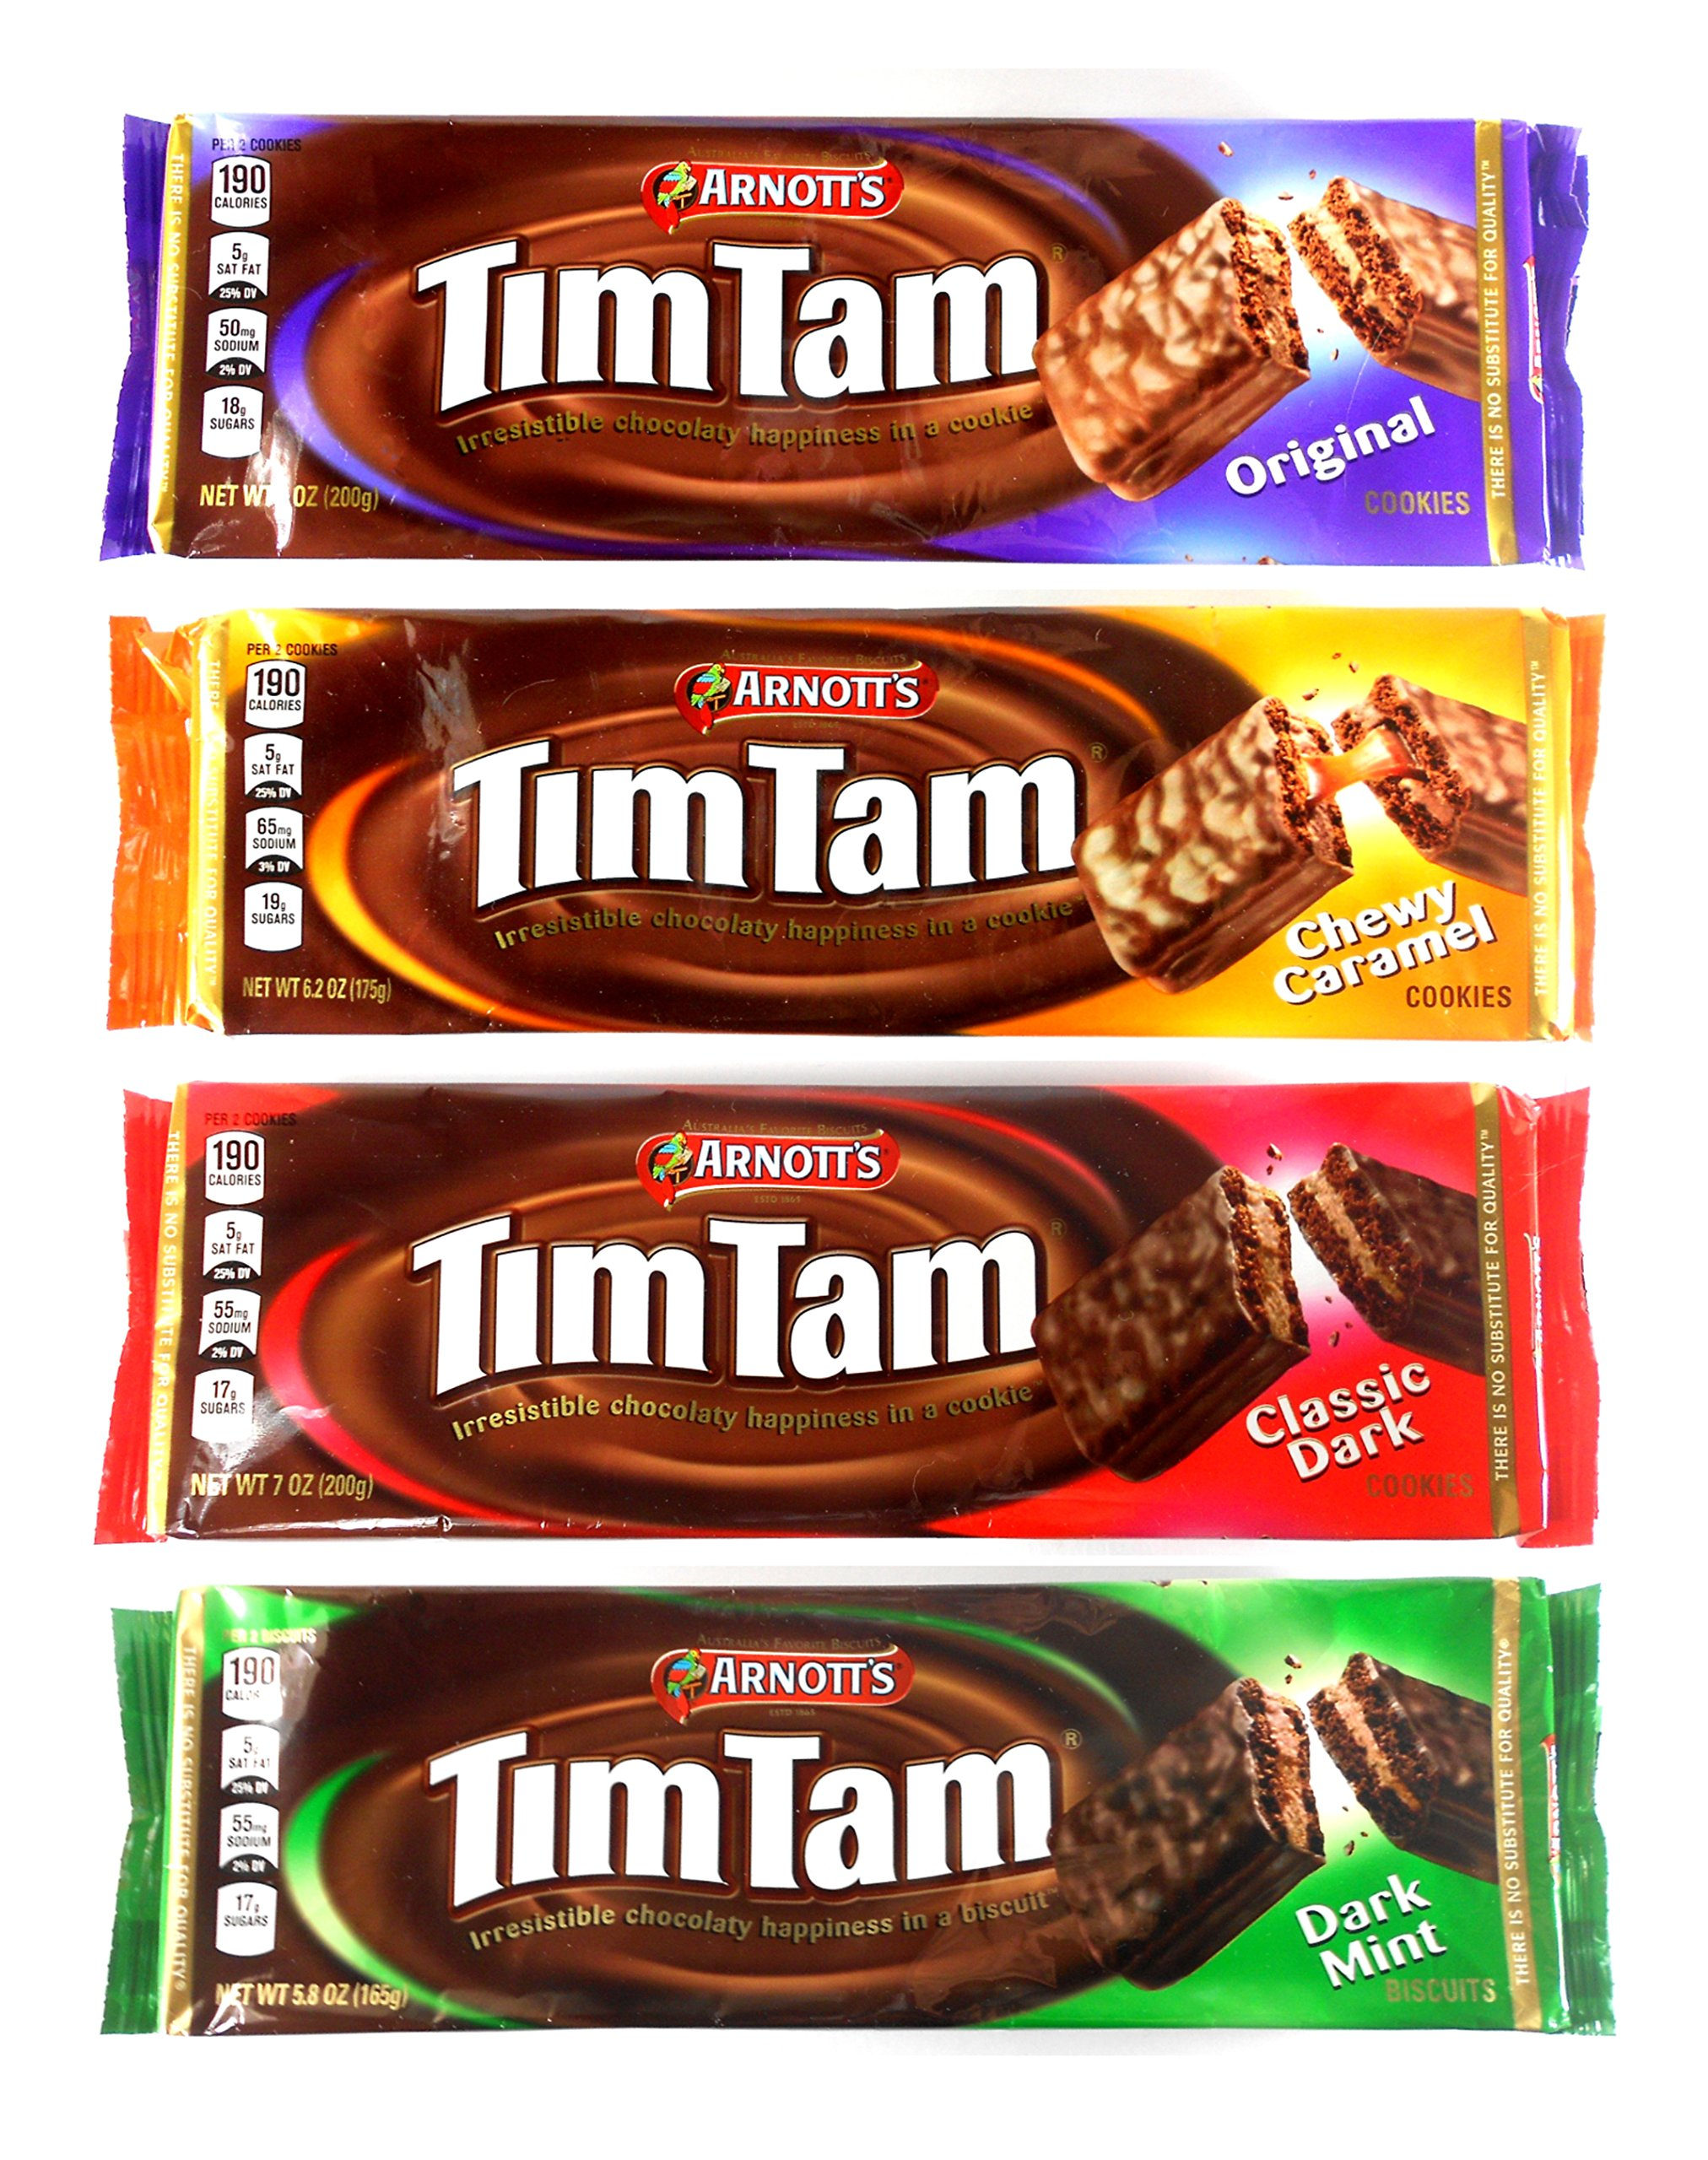 Arnott's Tim Tam Australian Chocolate Cookies Pack of 4 Variety (Original, Caramel, Dark, Dark Mint) Full Size by Arnotts